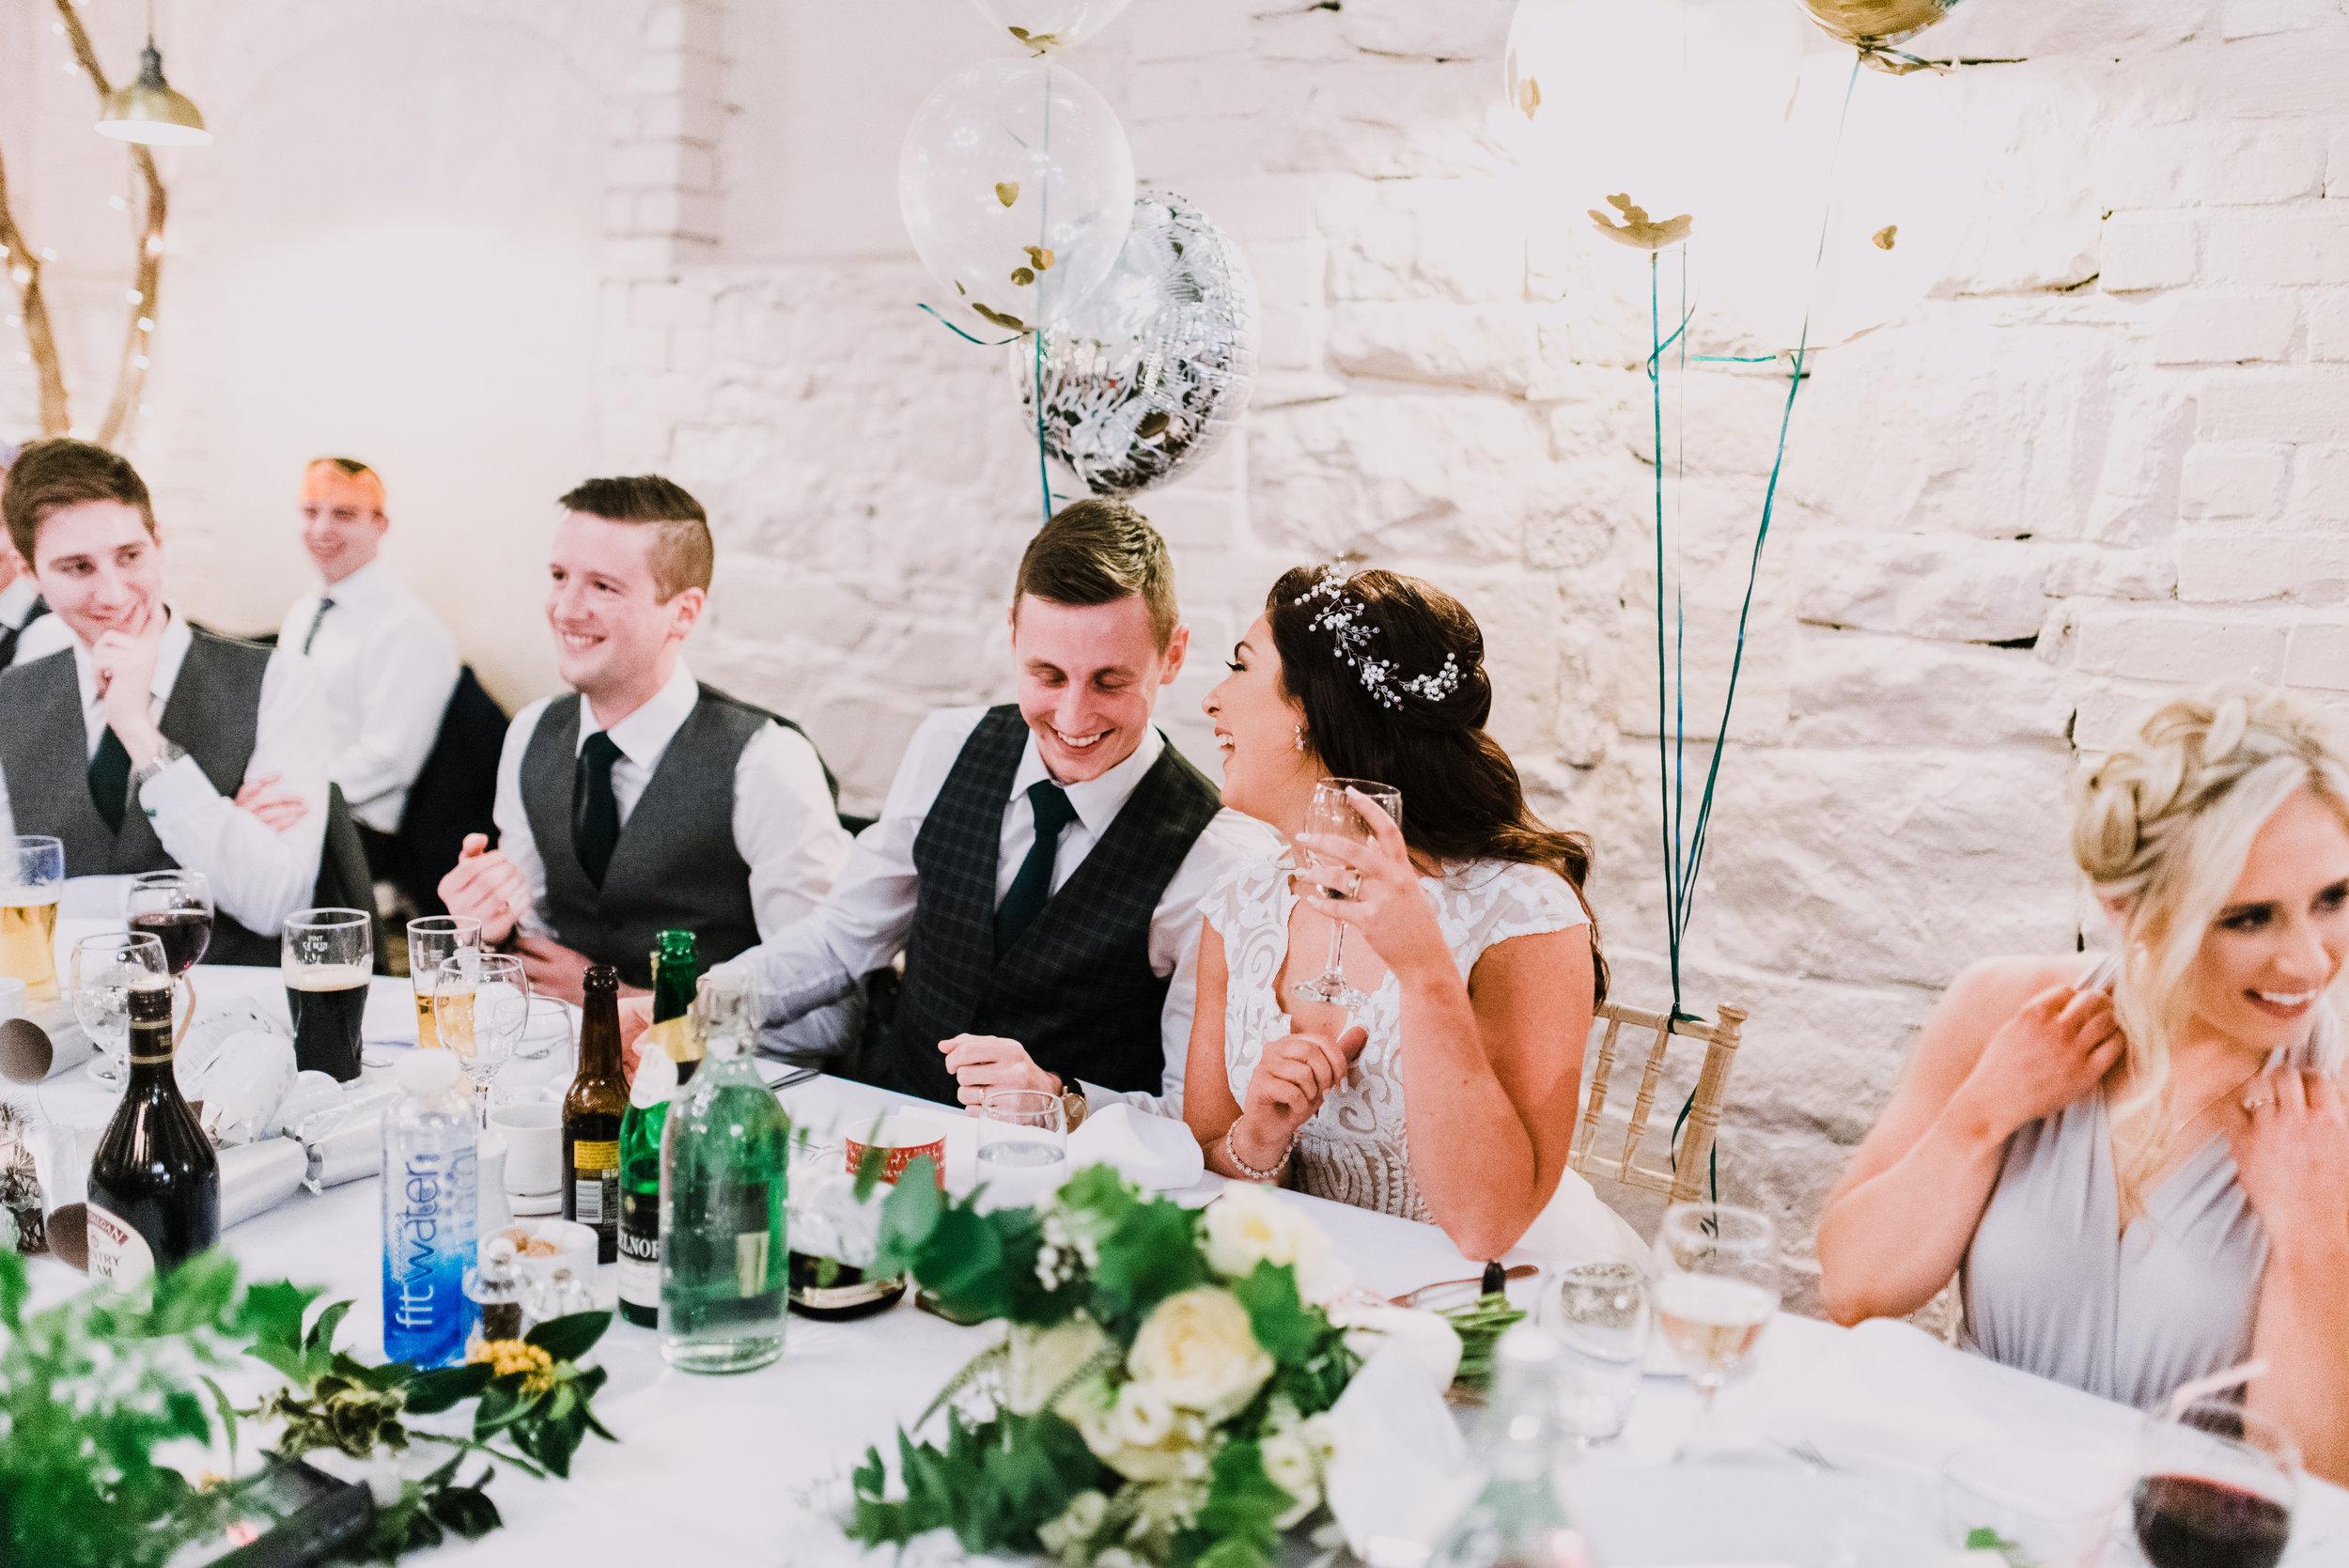 larchfield estate wedding, wedding venues northern ireland, barn wedding venues northern ireland, wedding photos larchfield estate, shane todd wedding, larchfield wedding decor ideas (18).jpg